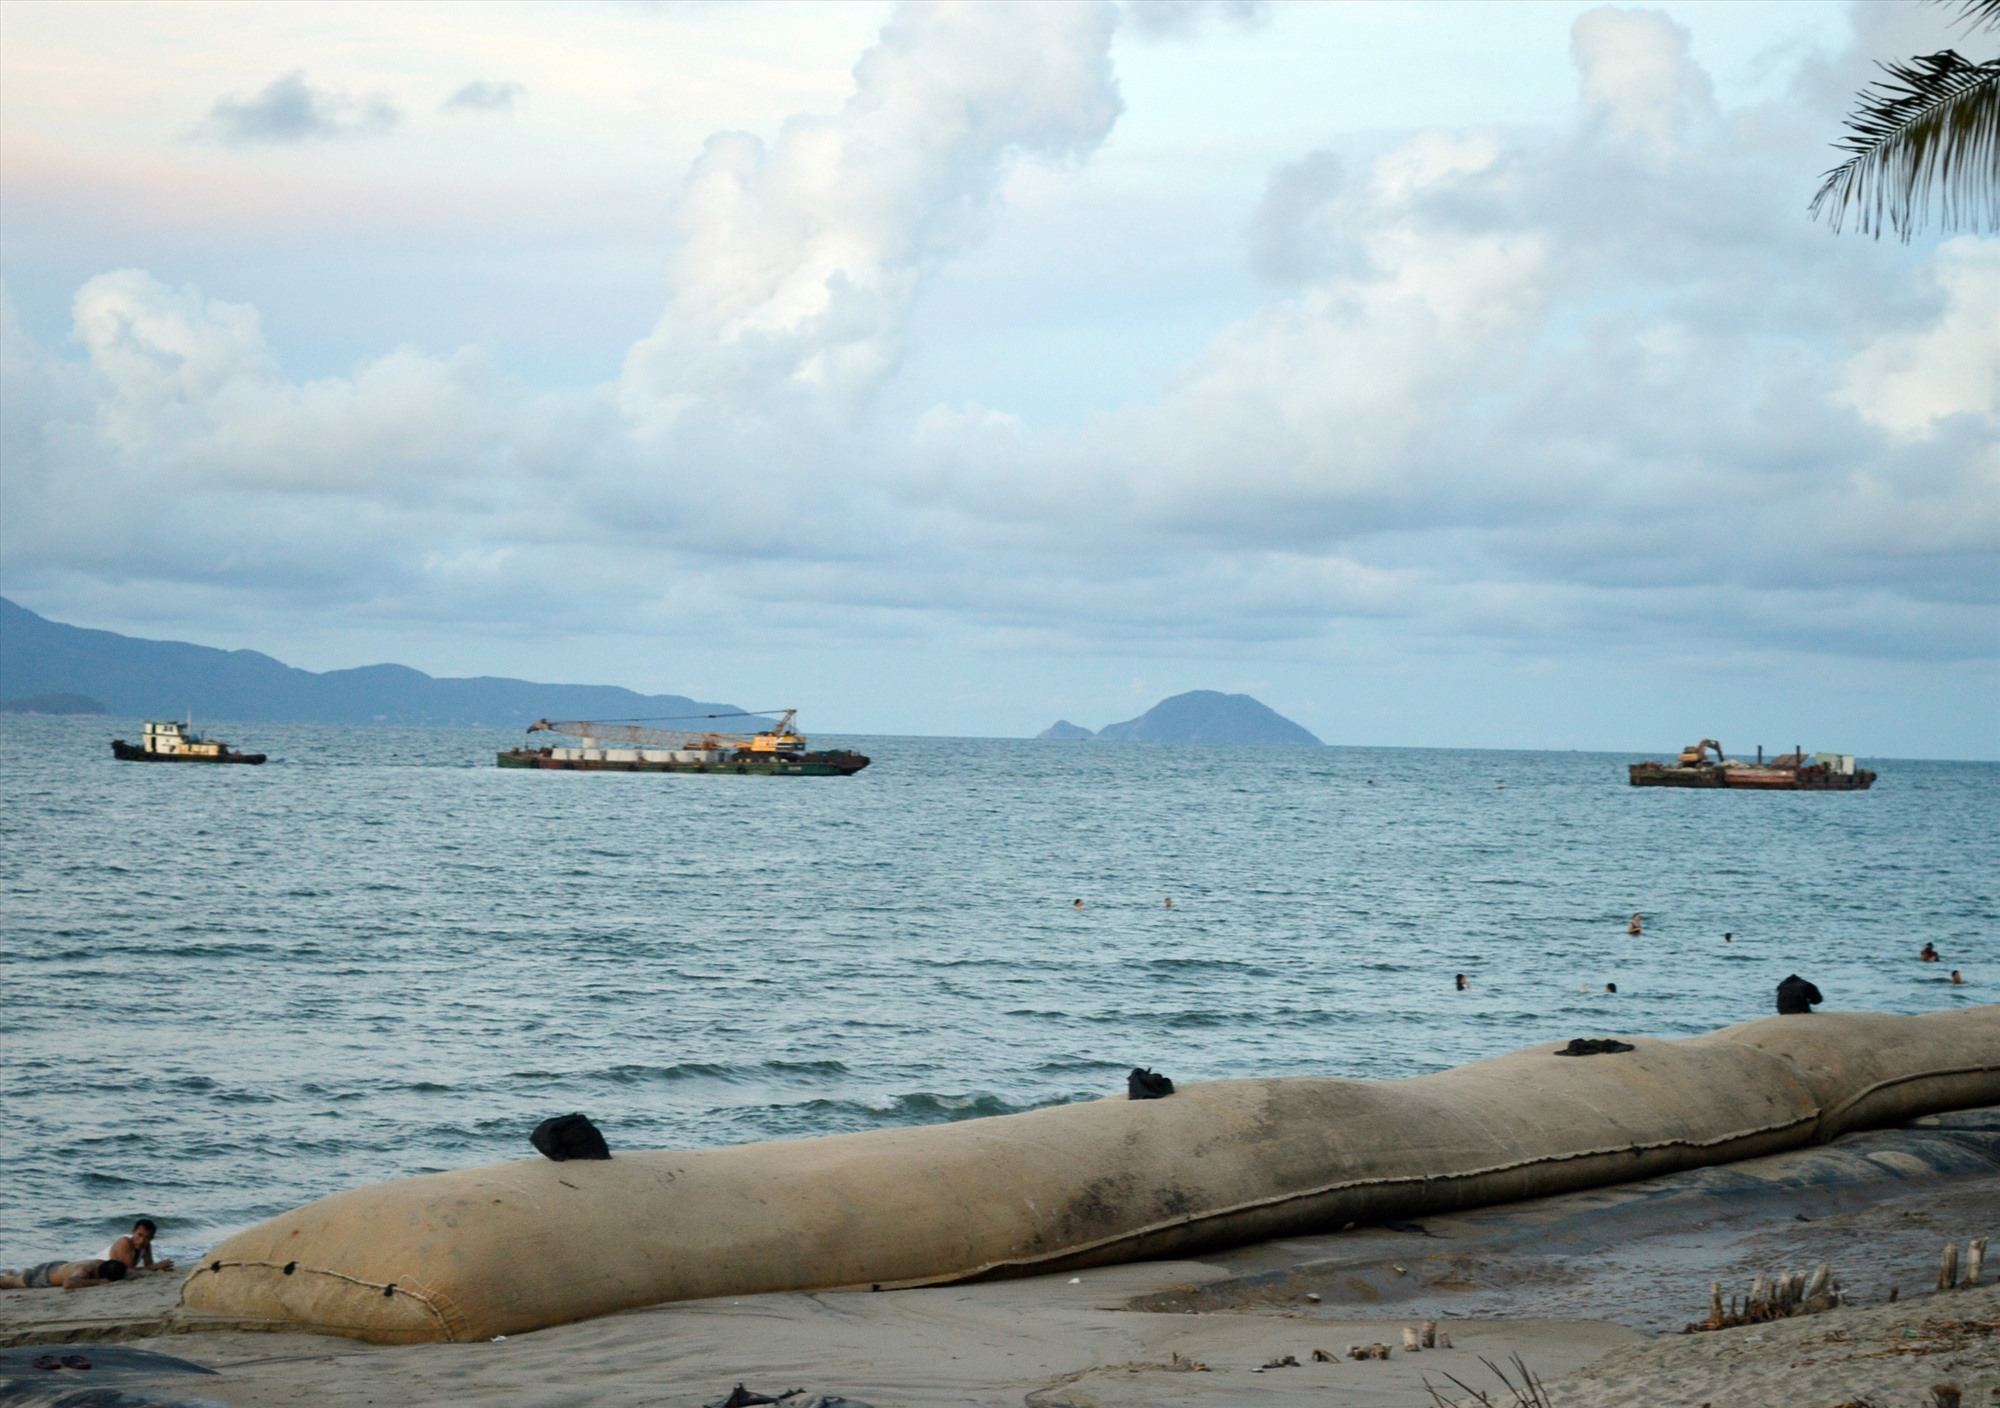 Cua Dai offshore submerged breakwater construction